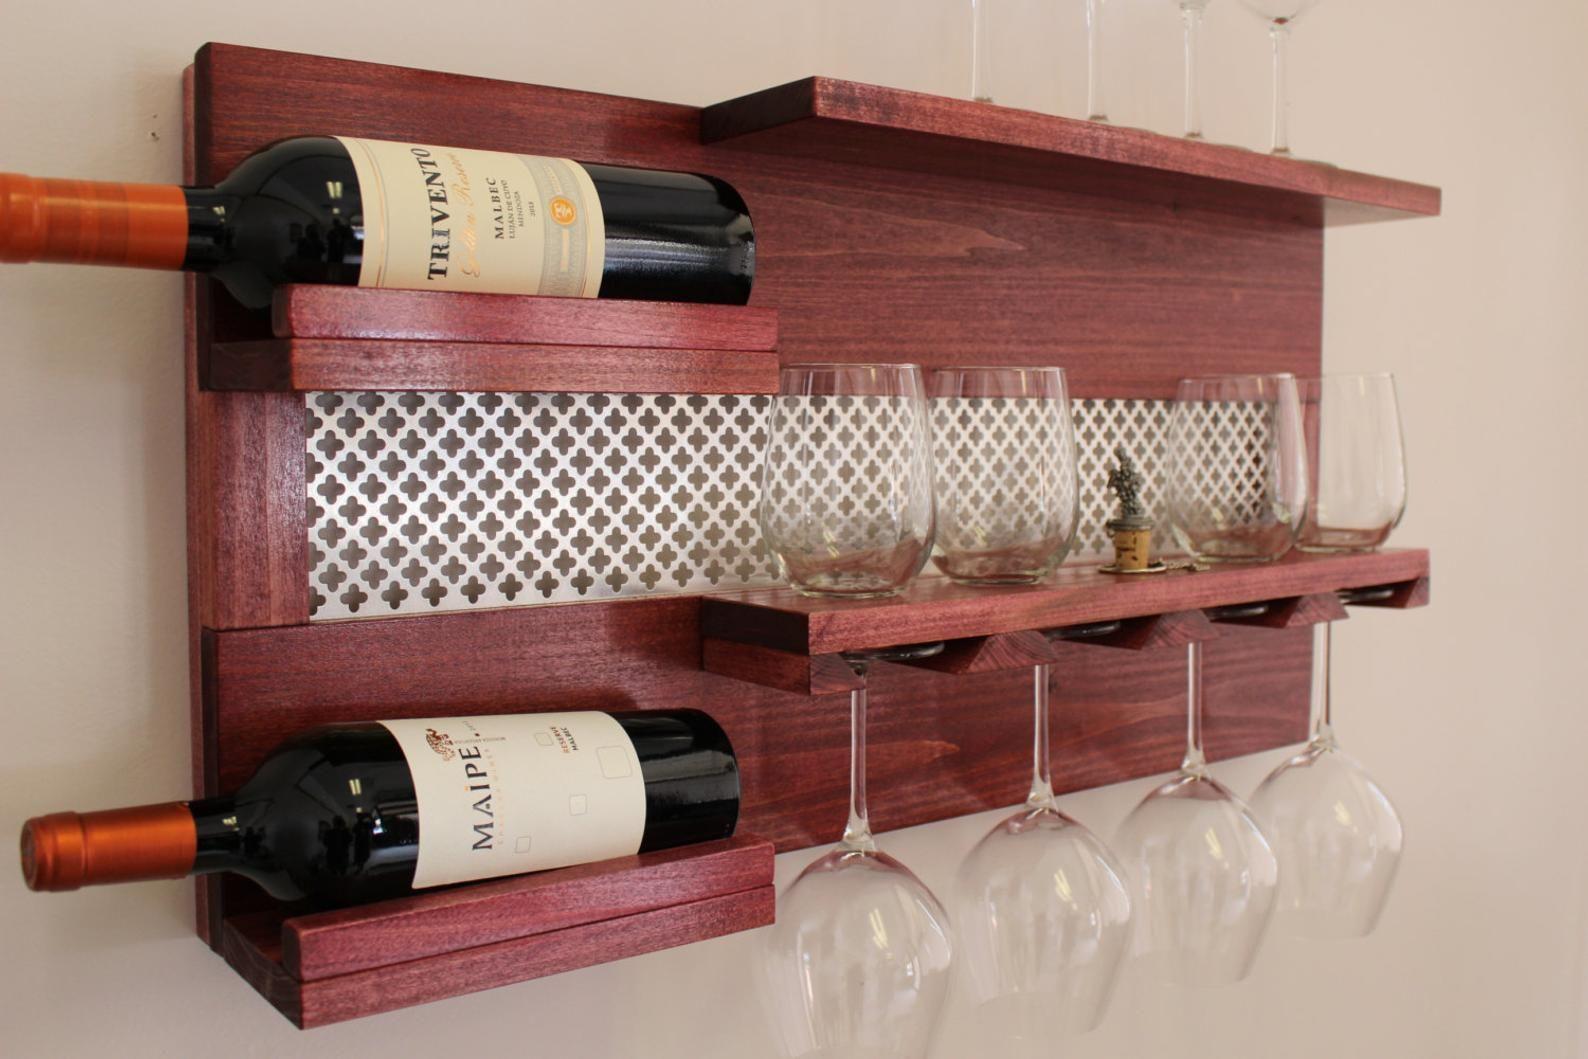 Stunning Wall Mounted Wine And Liquor Rack With Shelves And Etsy Wine Rack Wall Wine Glass Shelf Liquor Shelf